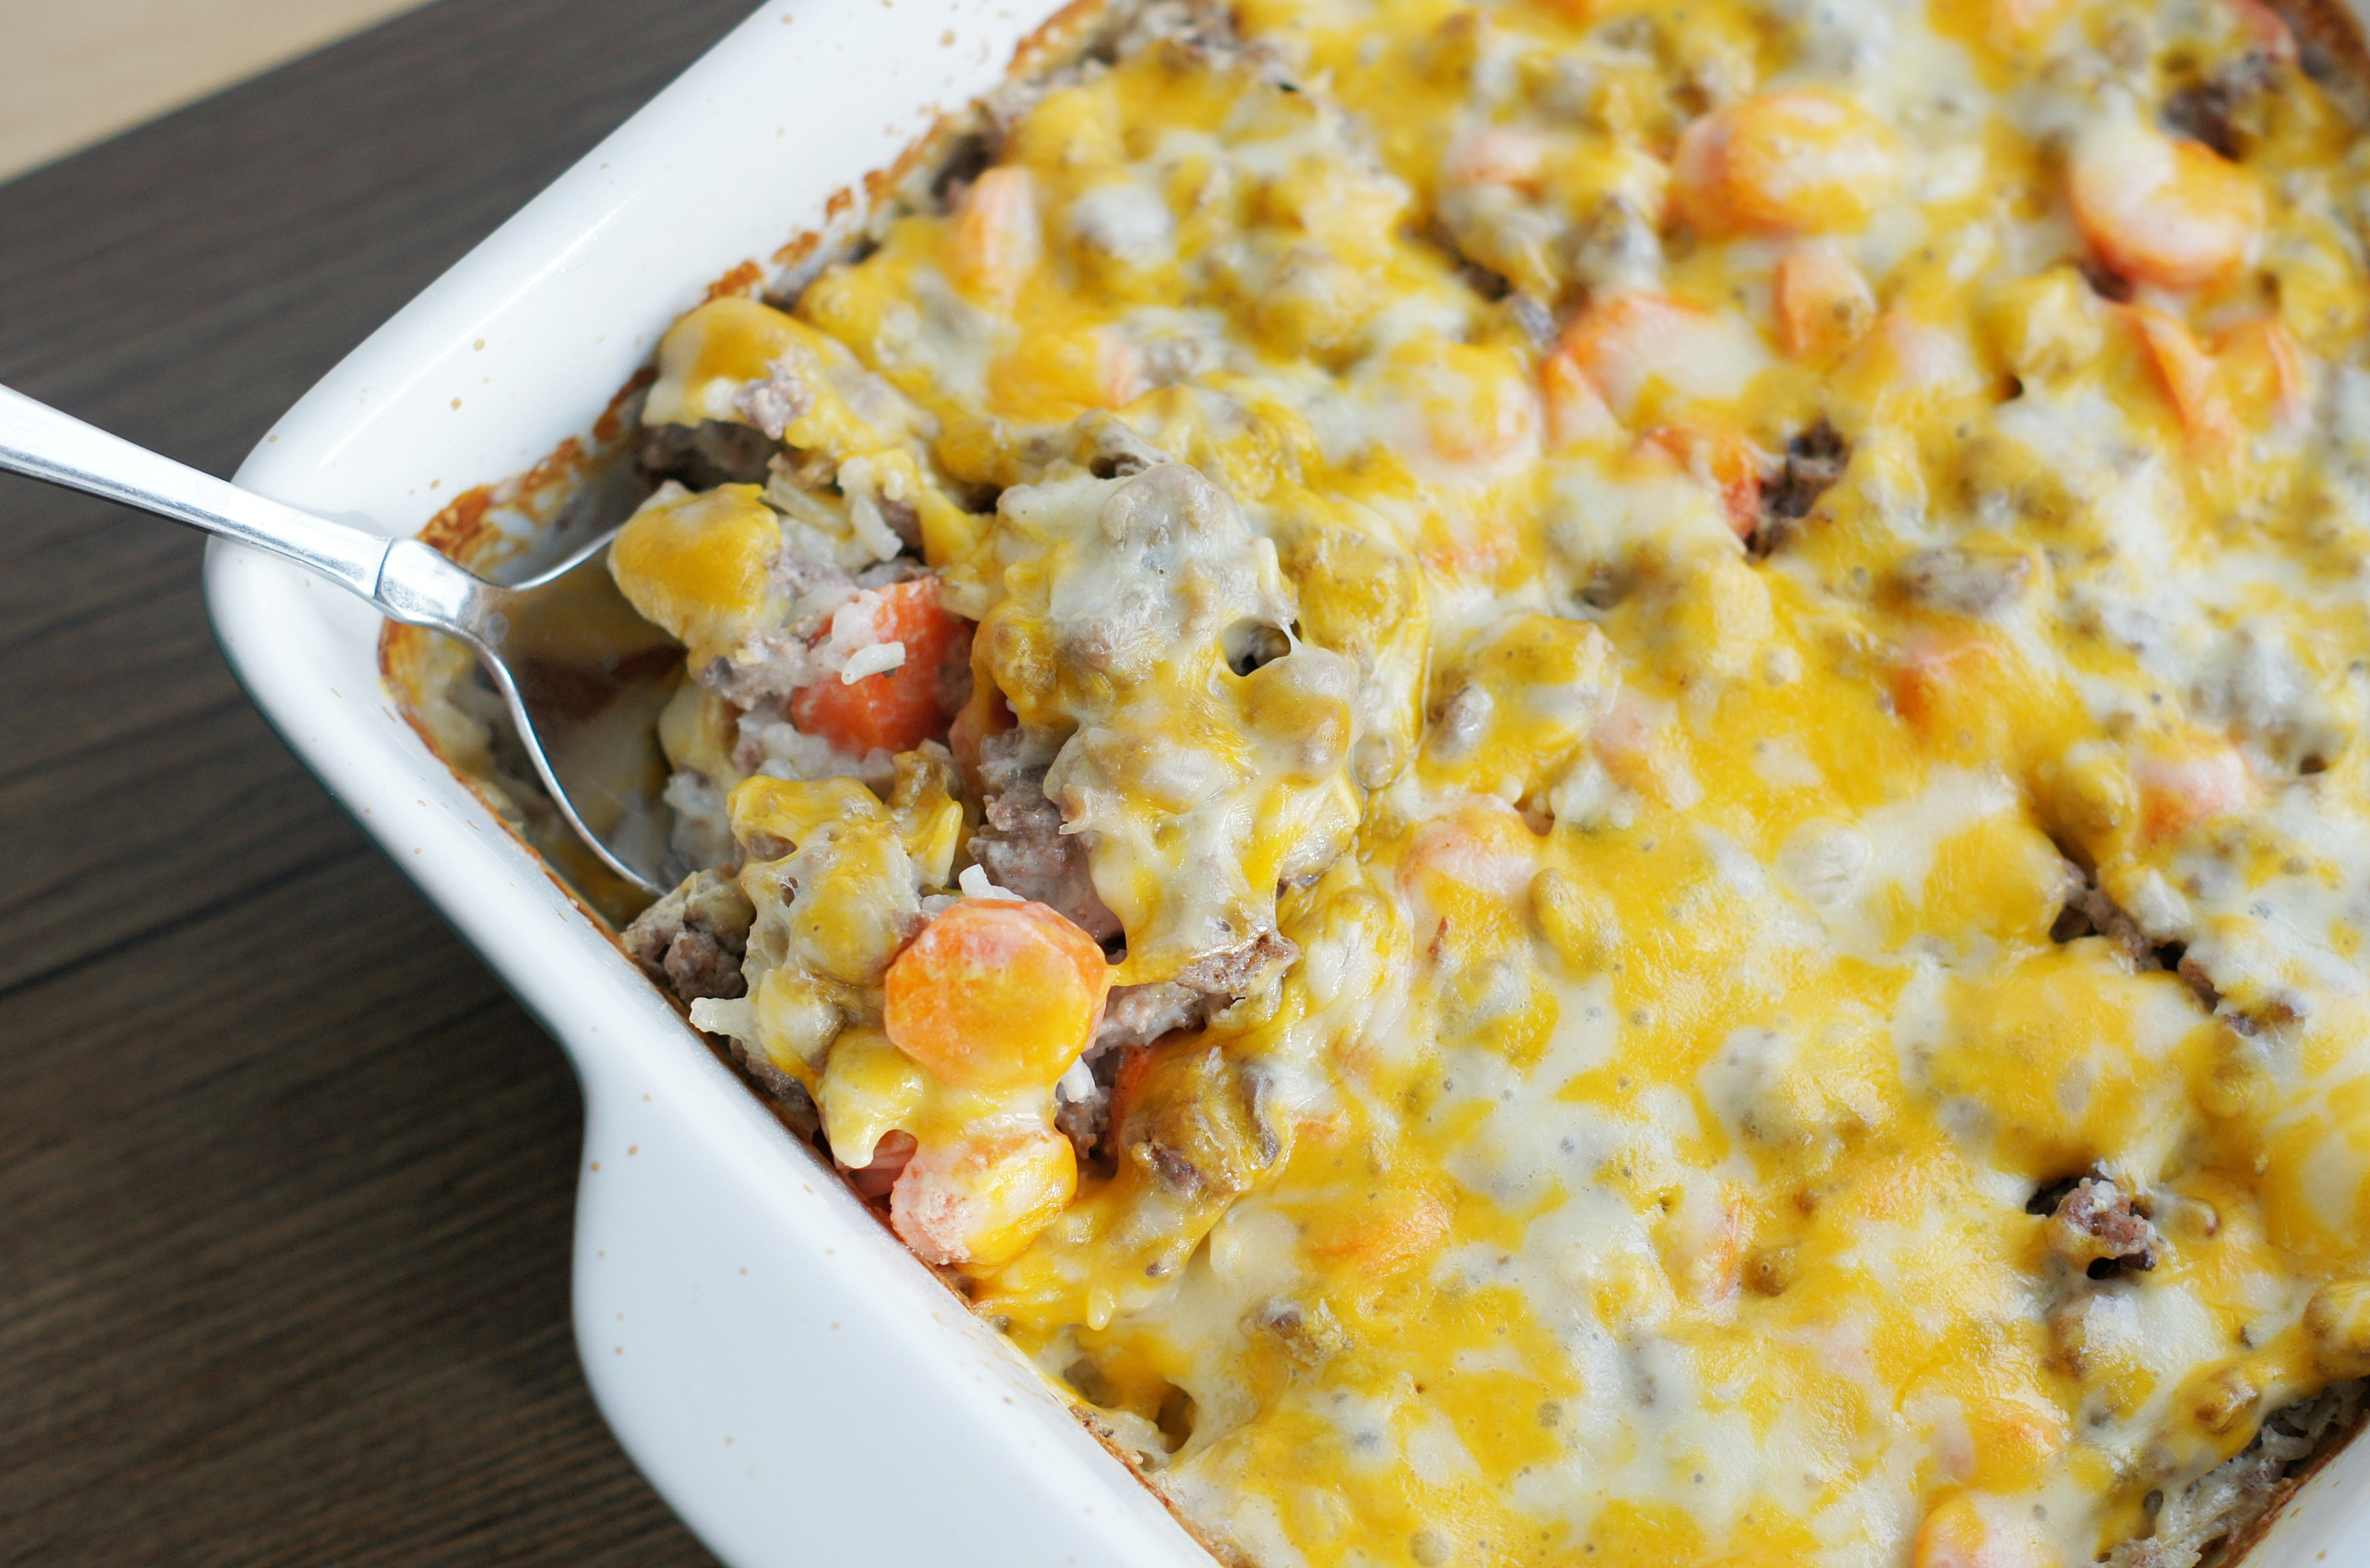 Ground Beef Casserole Recipes  Cheesy Ground Beef and Rice Casserole 5 Boys Baker